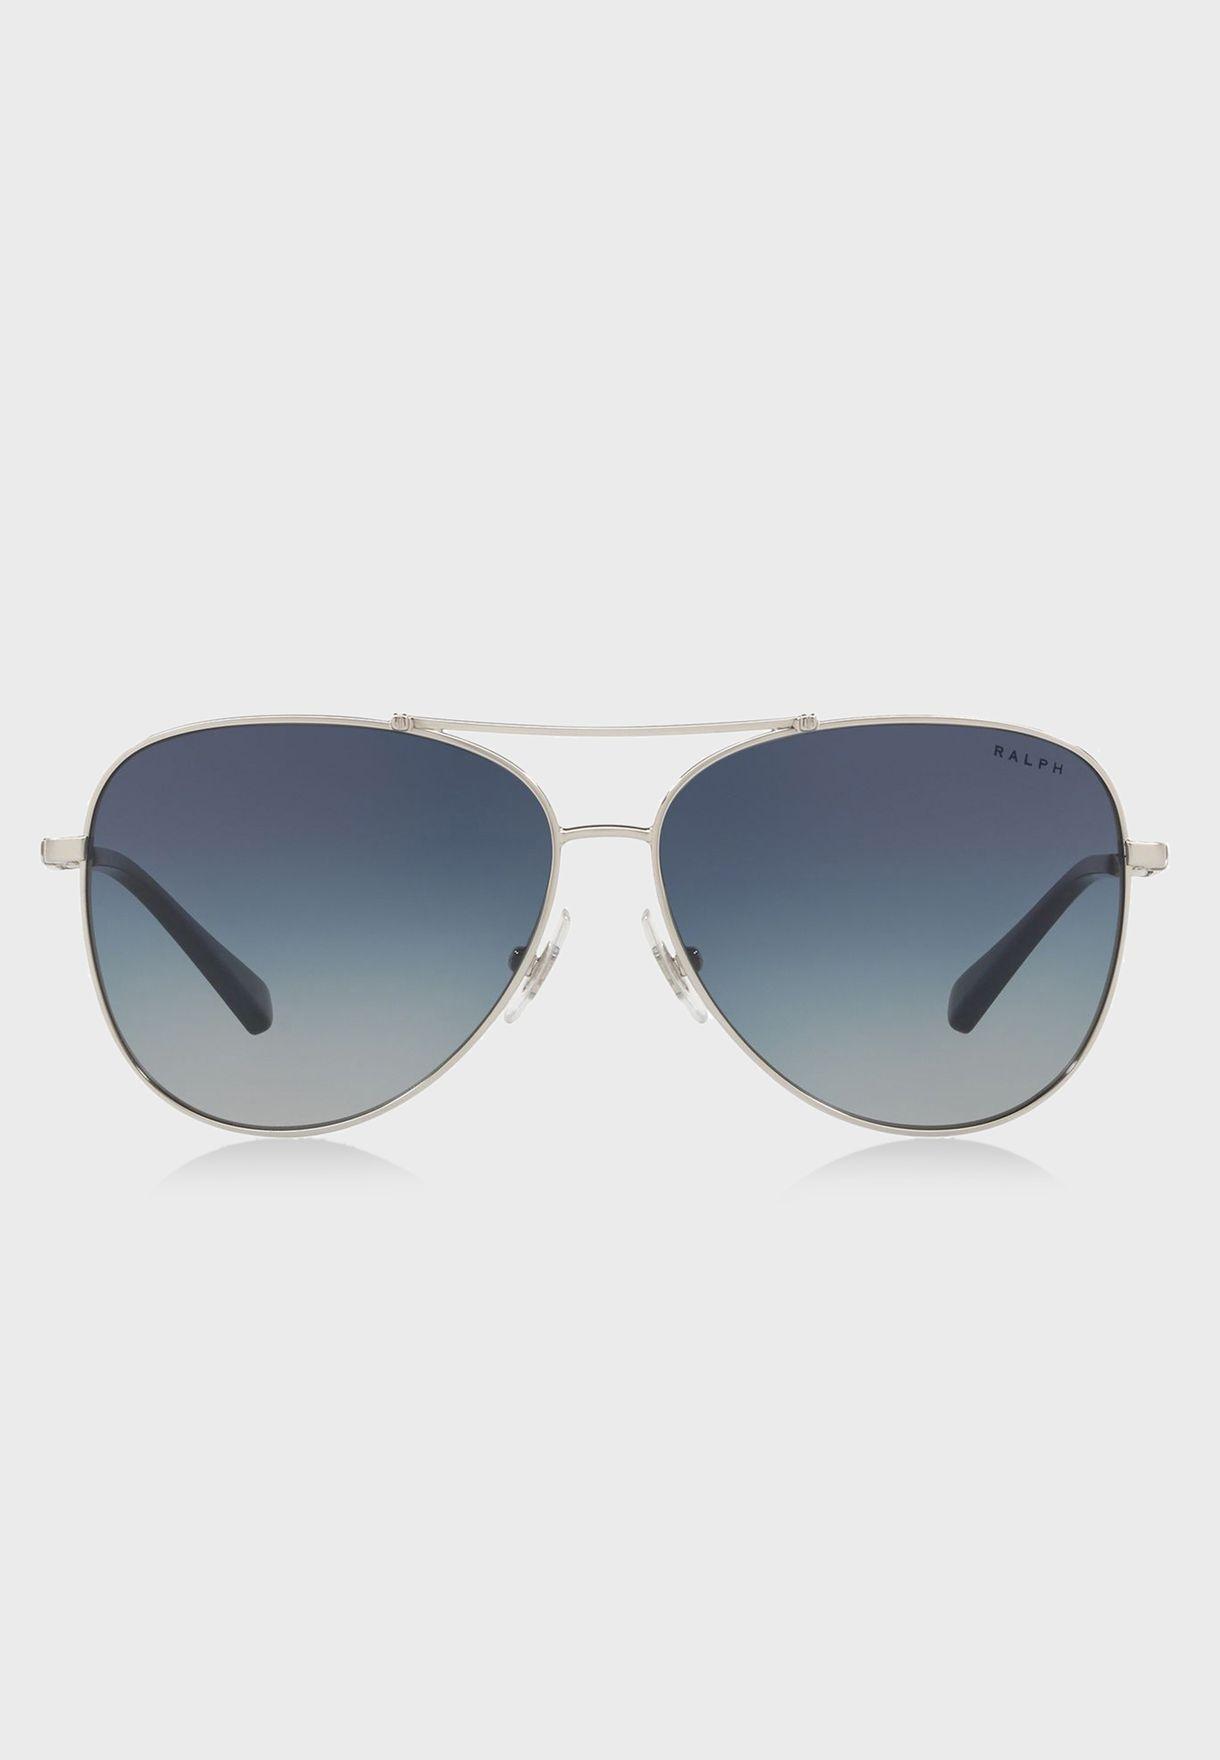 20648d82c28 Shop Polo Ralph Lauren silver Aviator Sunglasses 8.05E+12 for Women ...